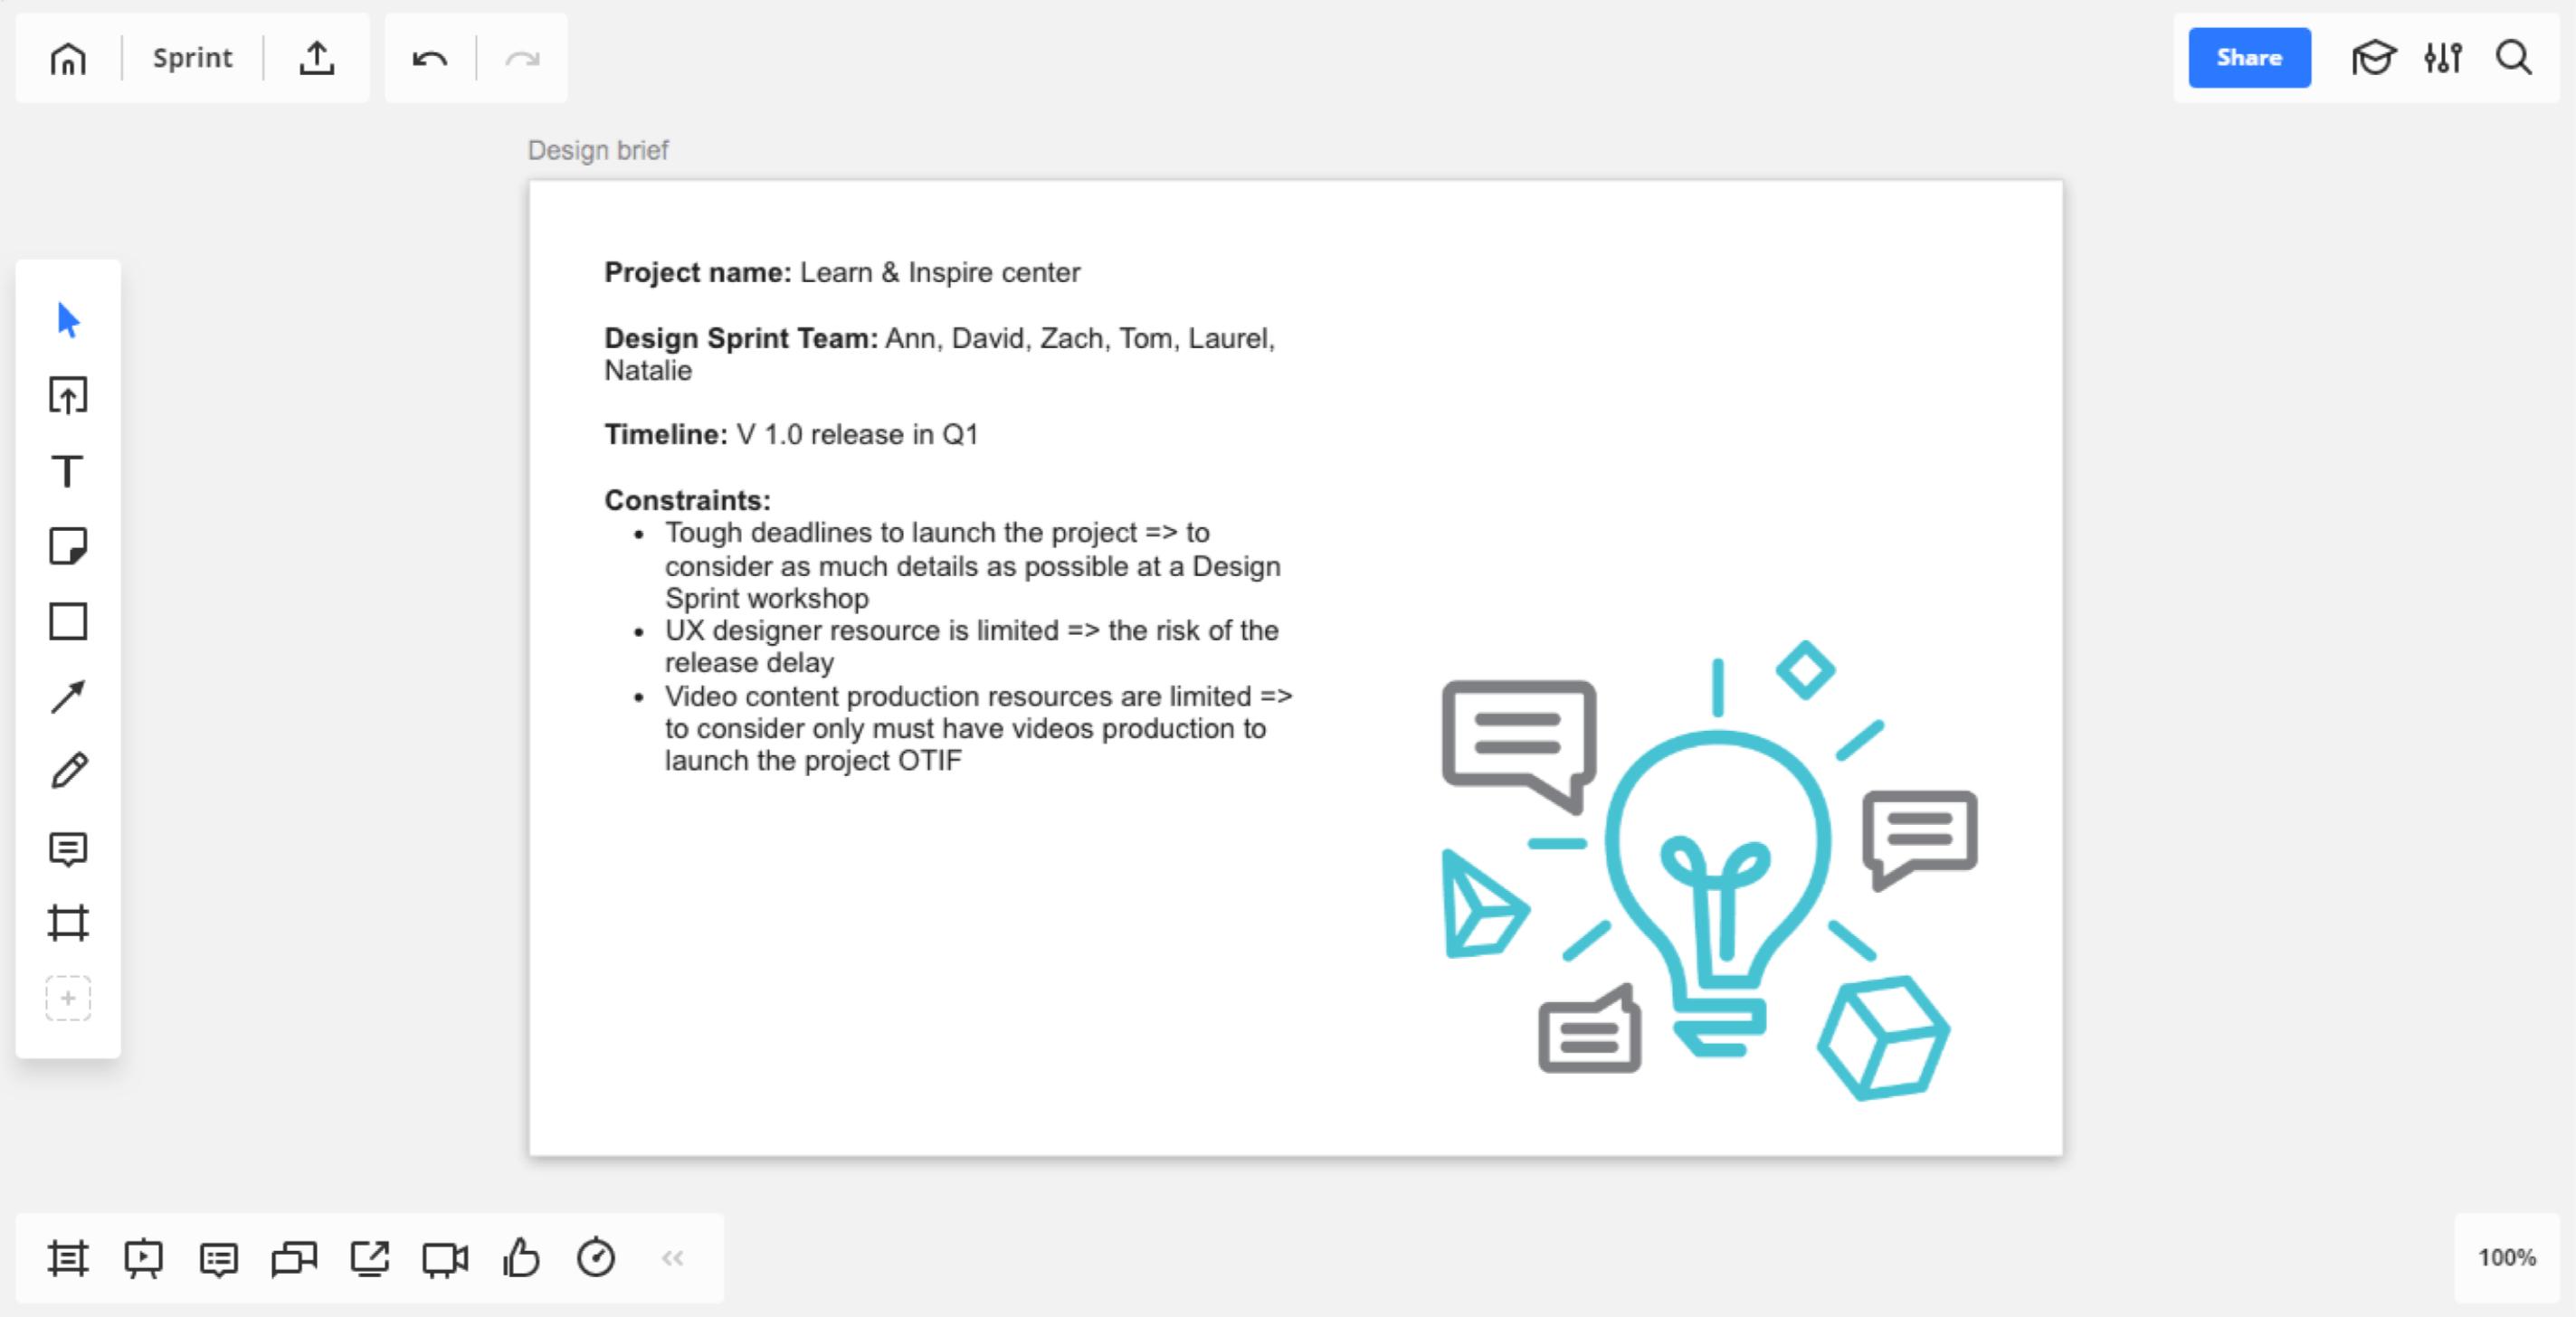 Design Sprint Guide Realtimeboard